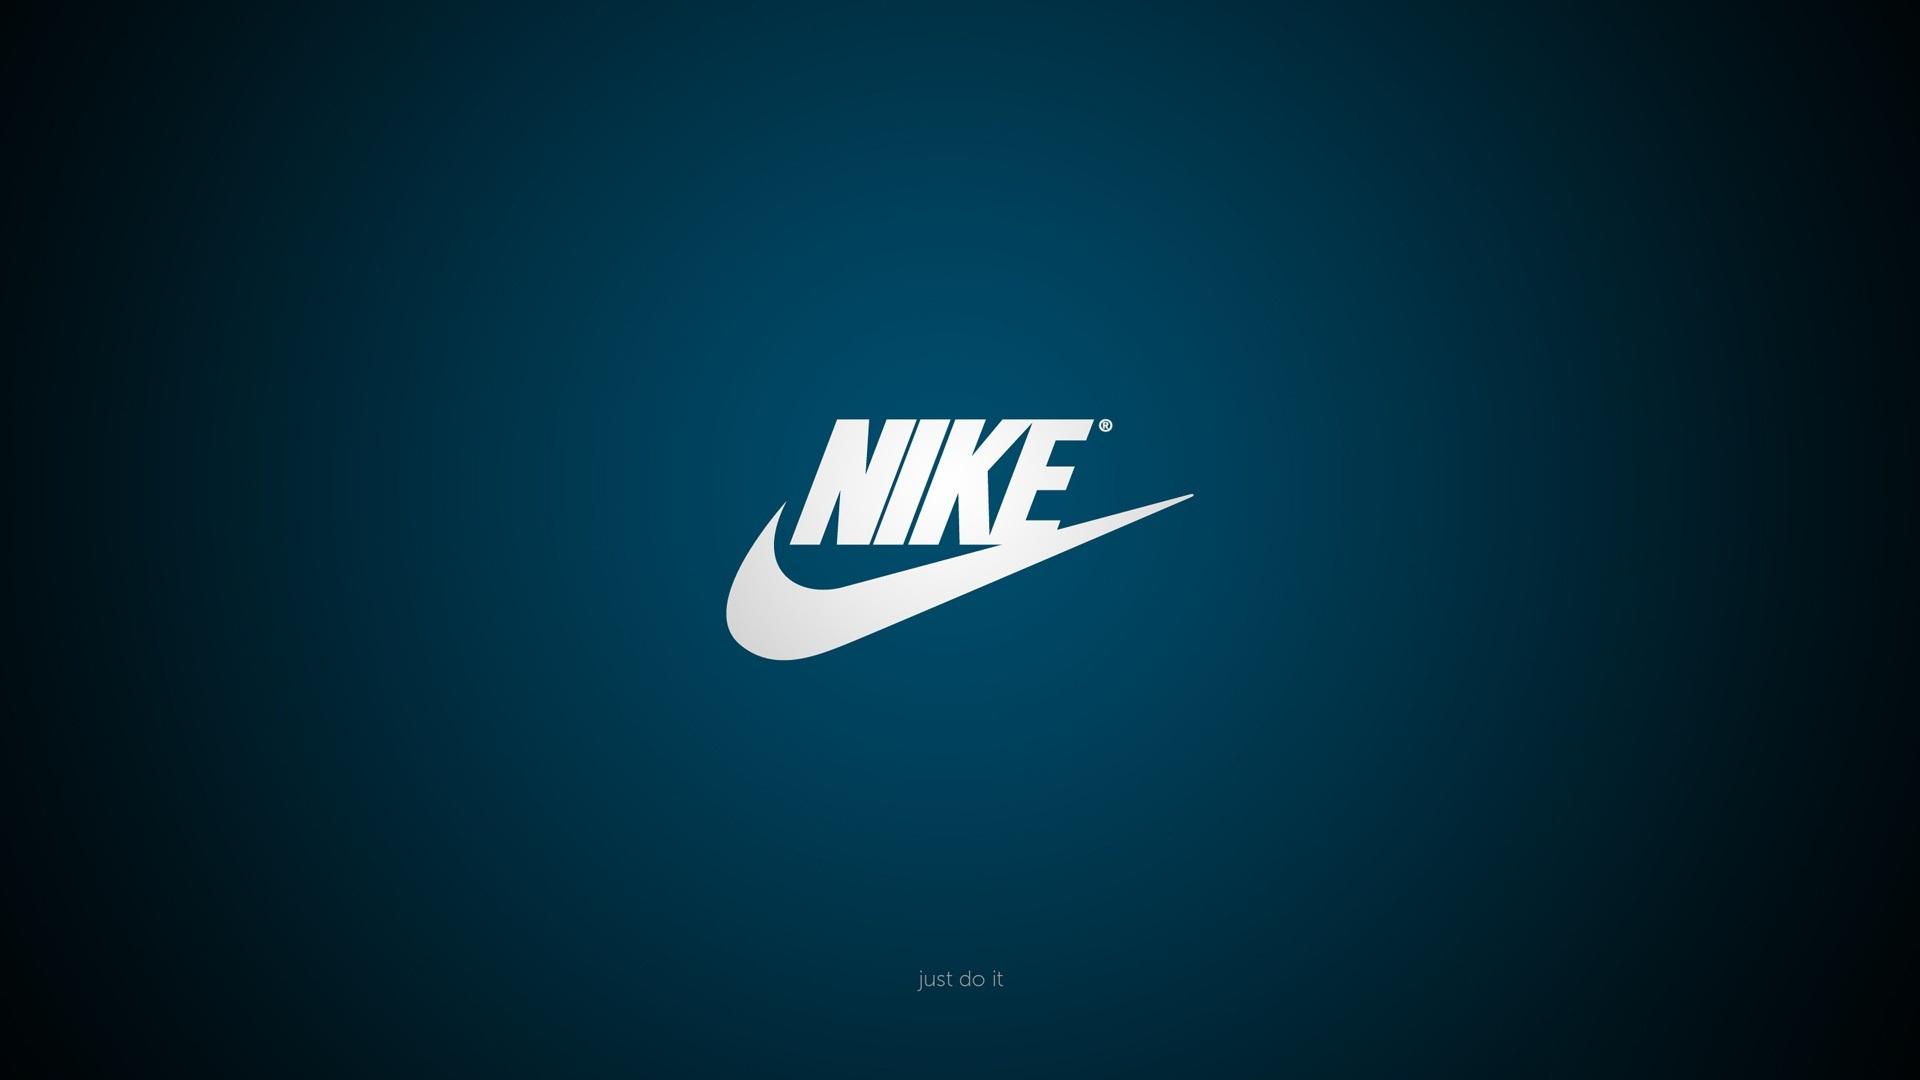 Nike Wallpapers Hd Nike Wallpapers 1280x1024 Nike Wallpapers 1920x1080